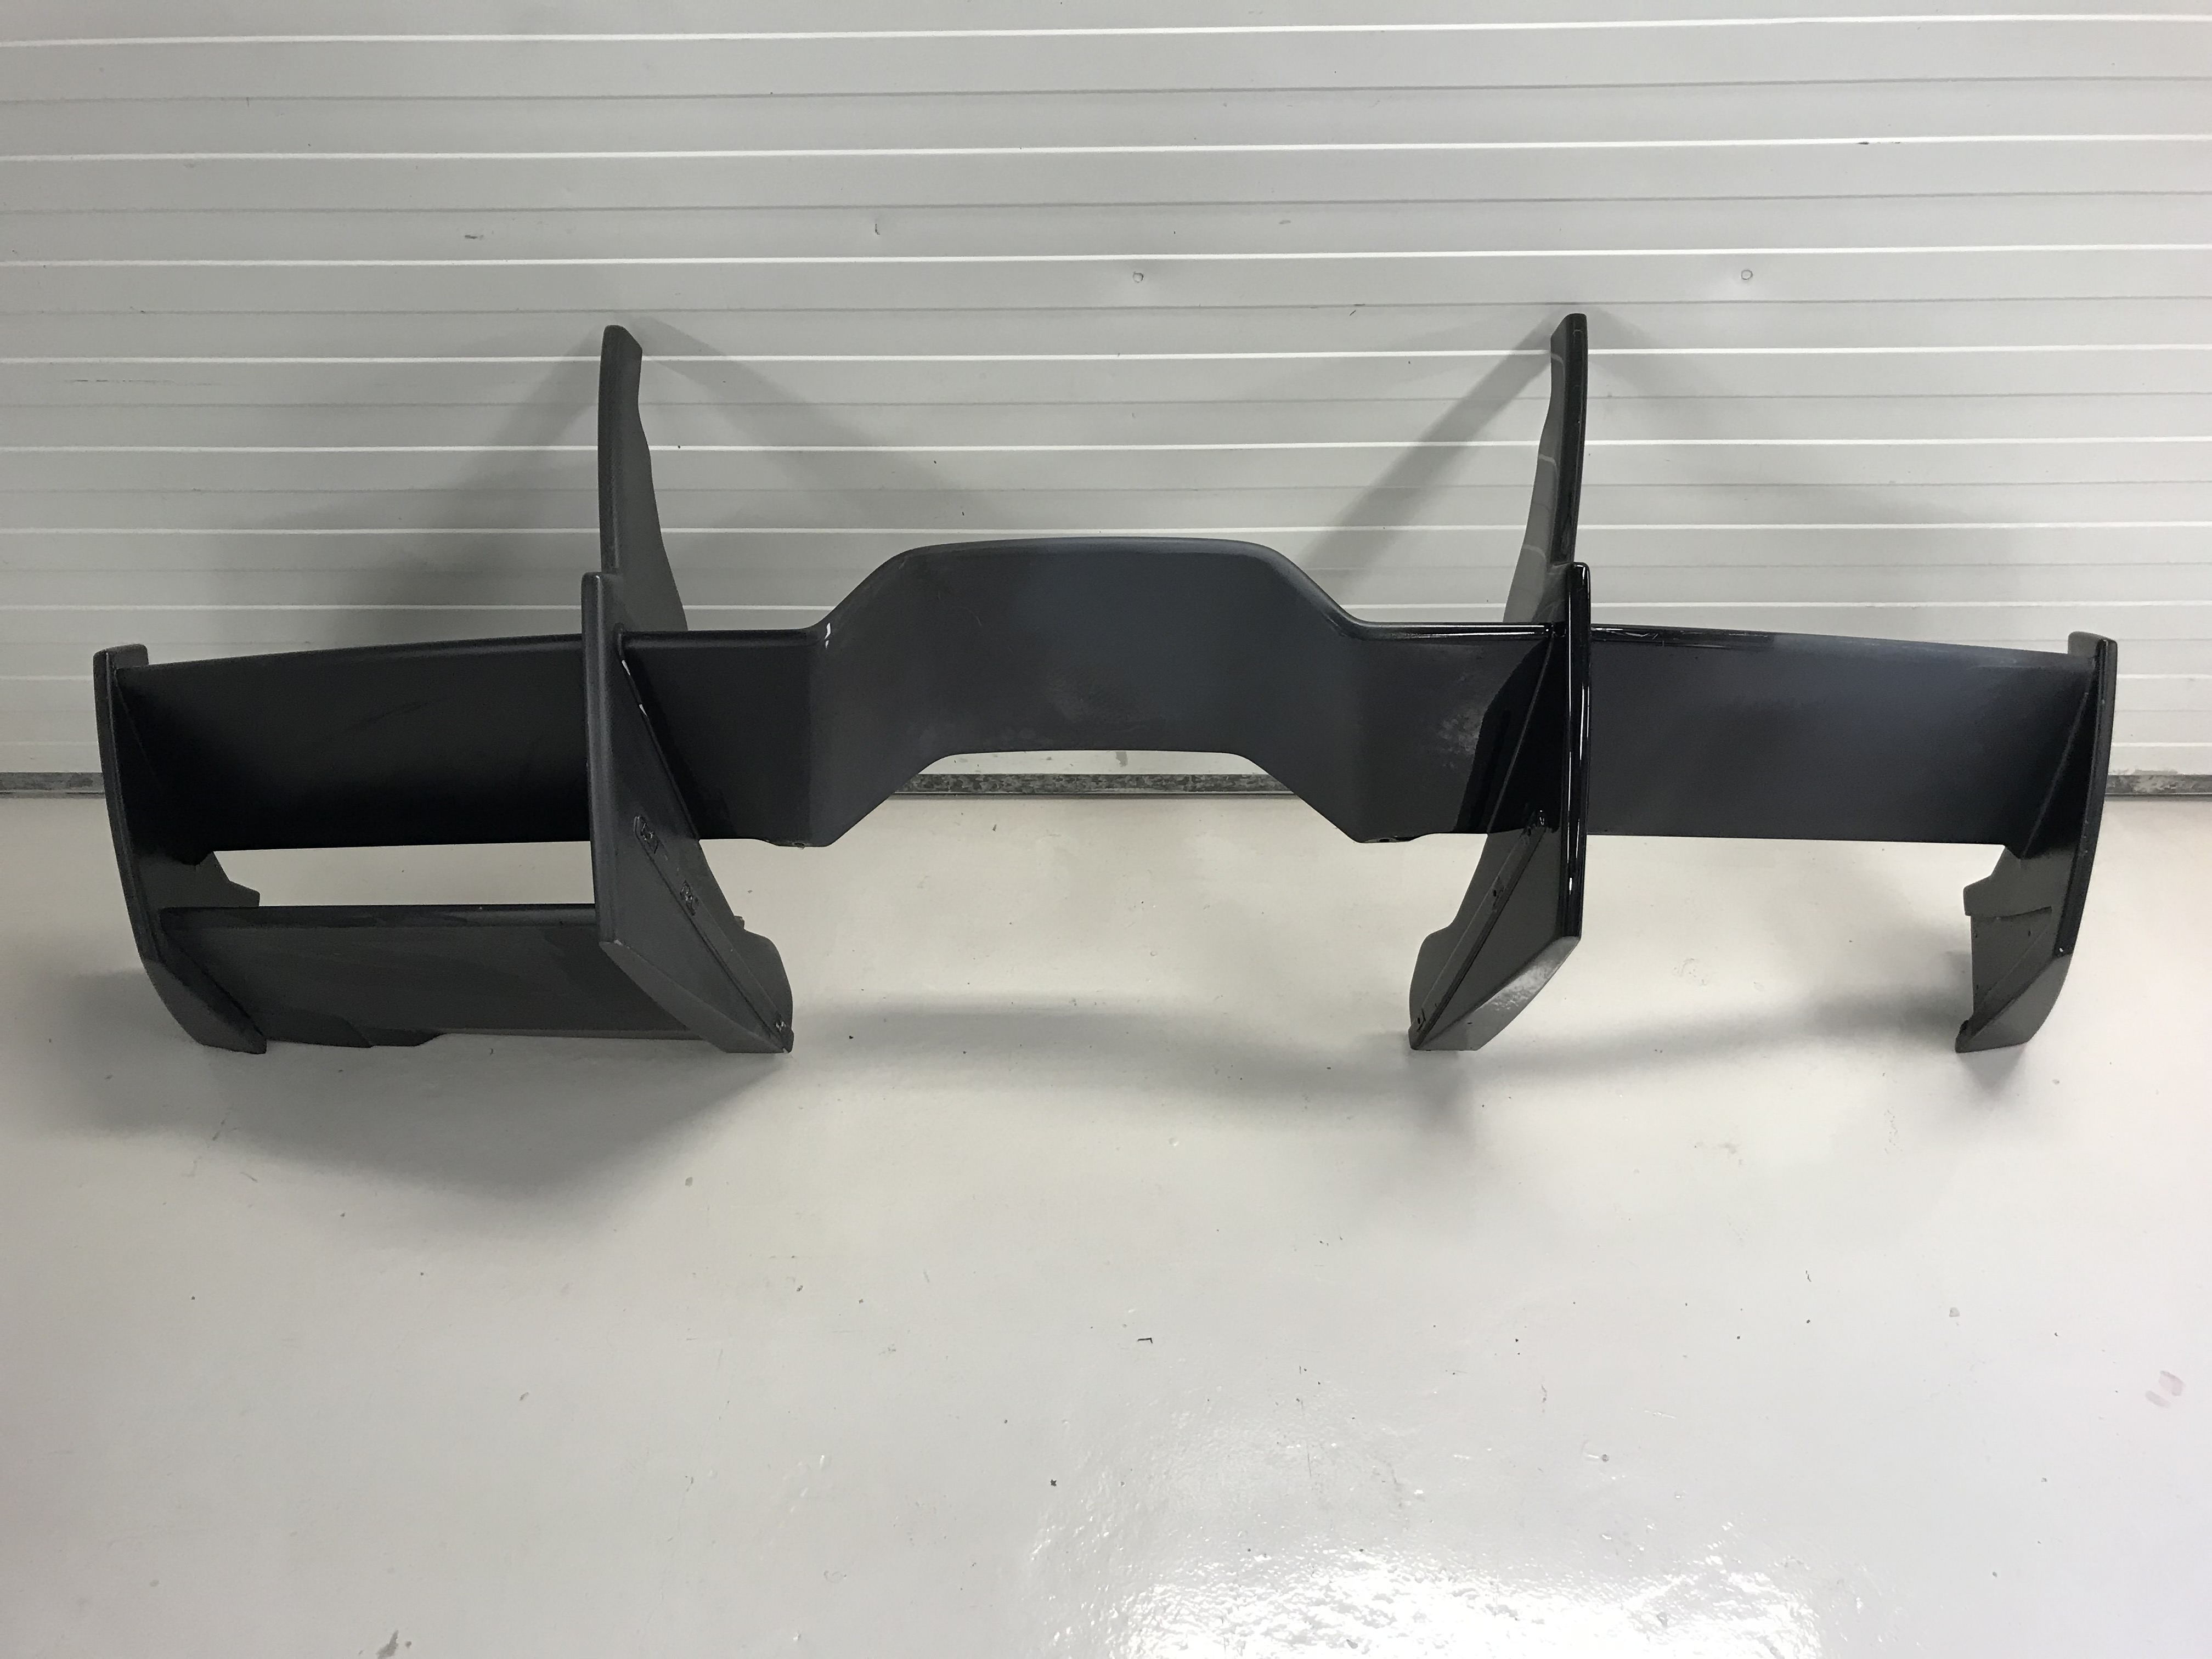 LP670-4 Super Veloce, Rear Bumper